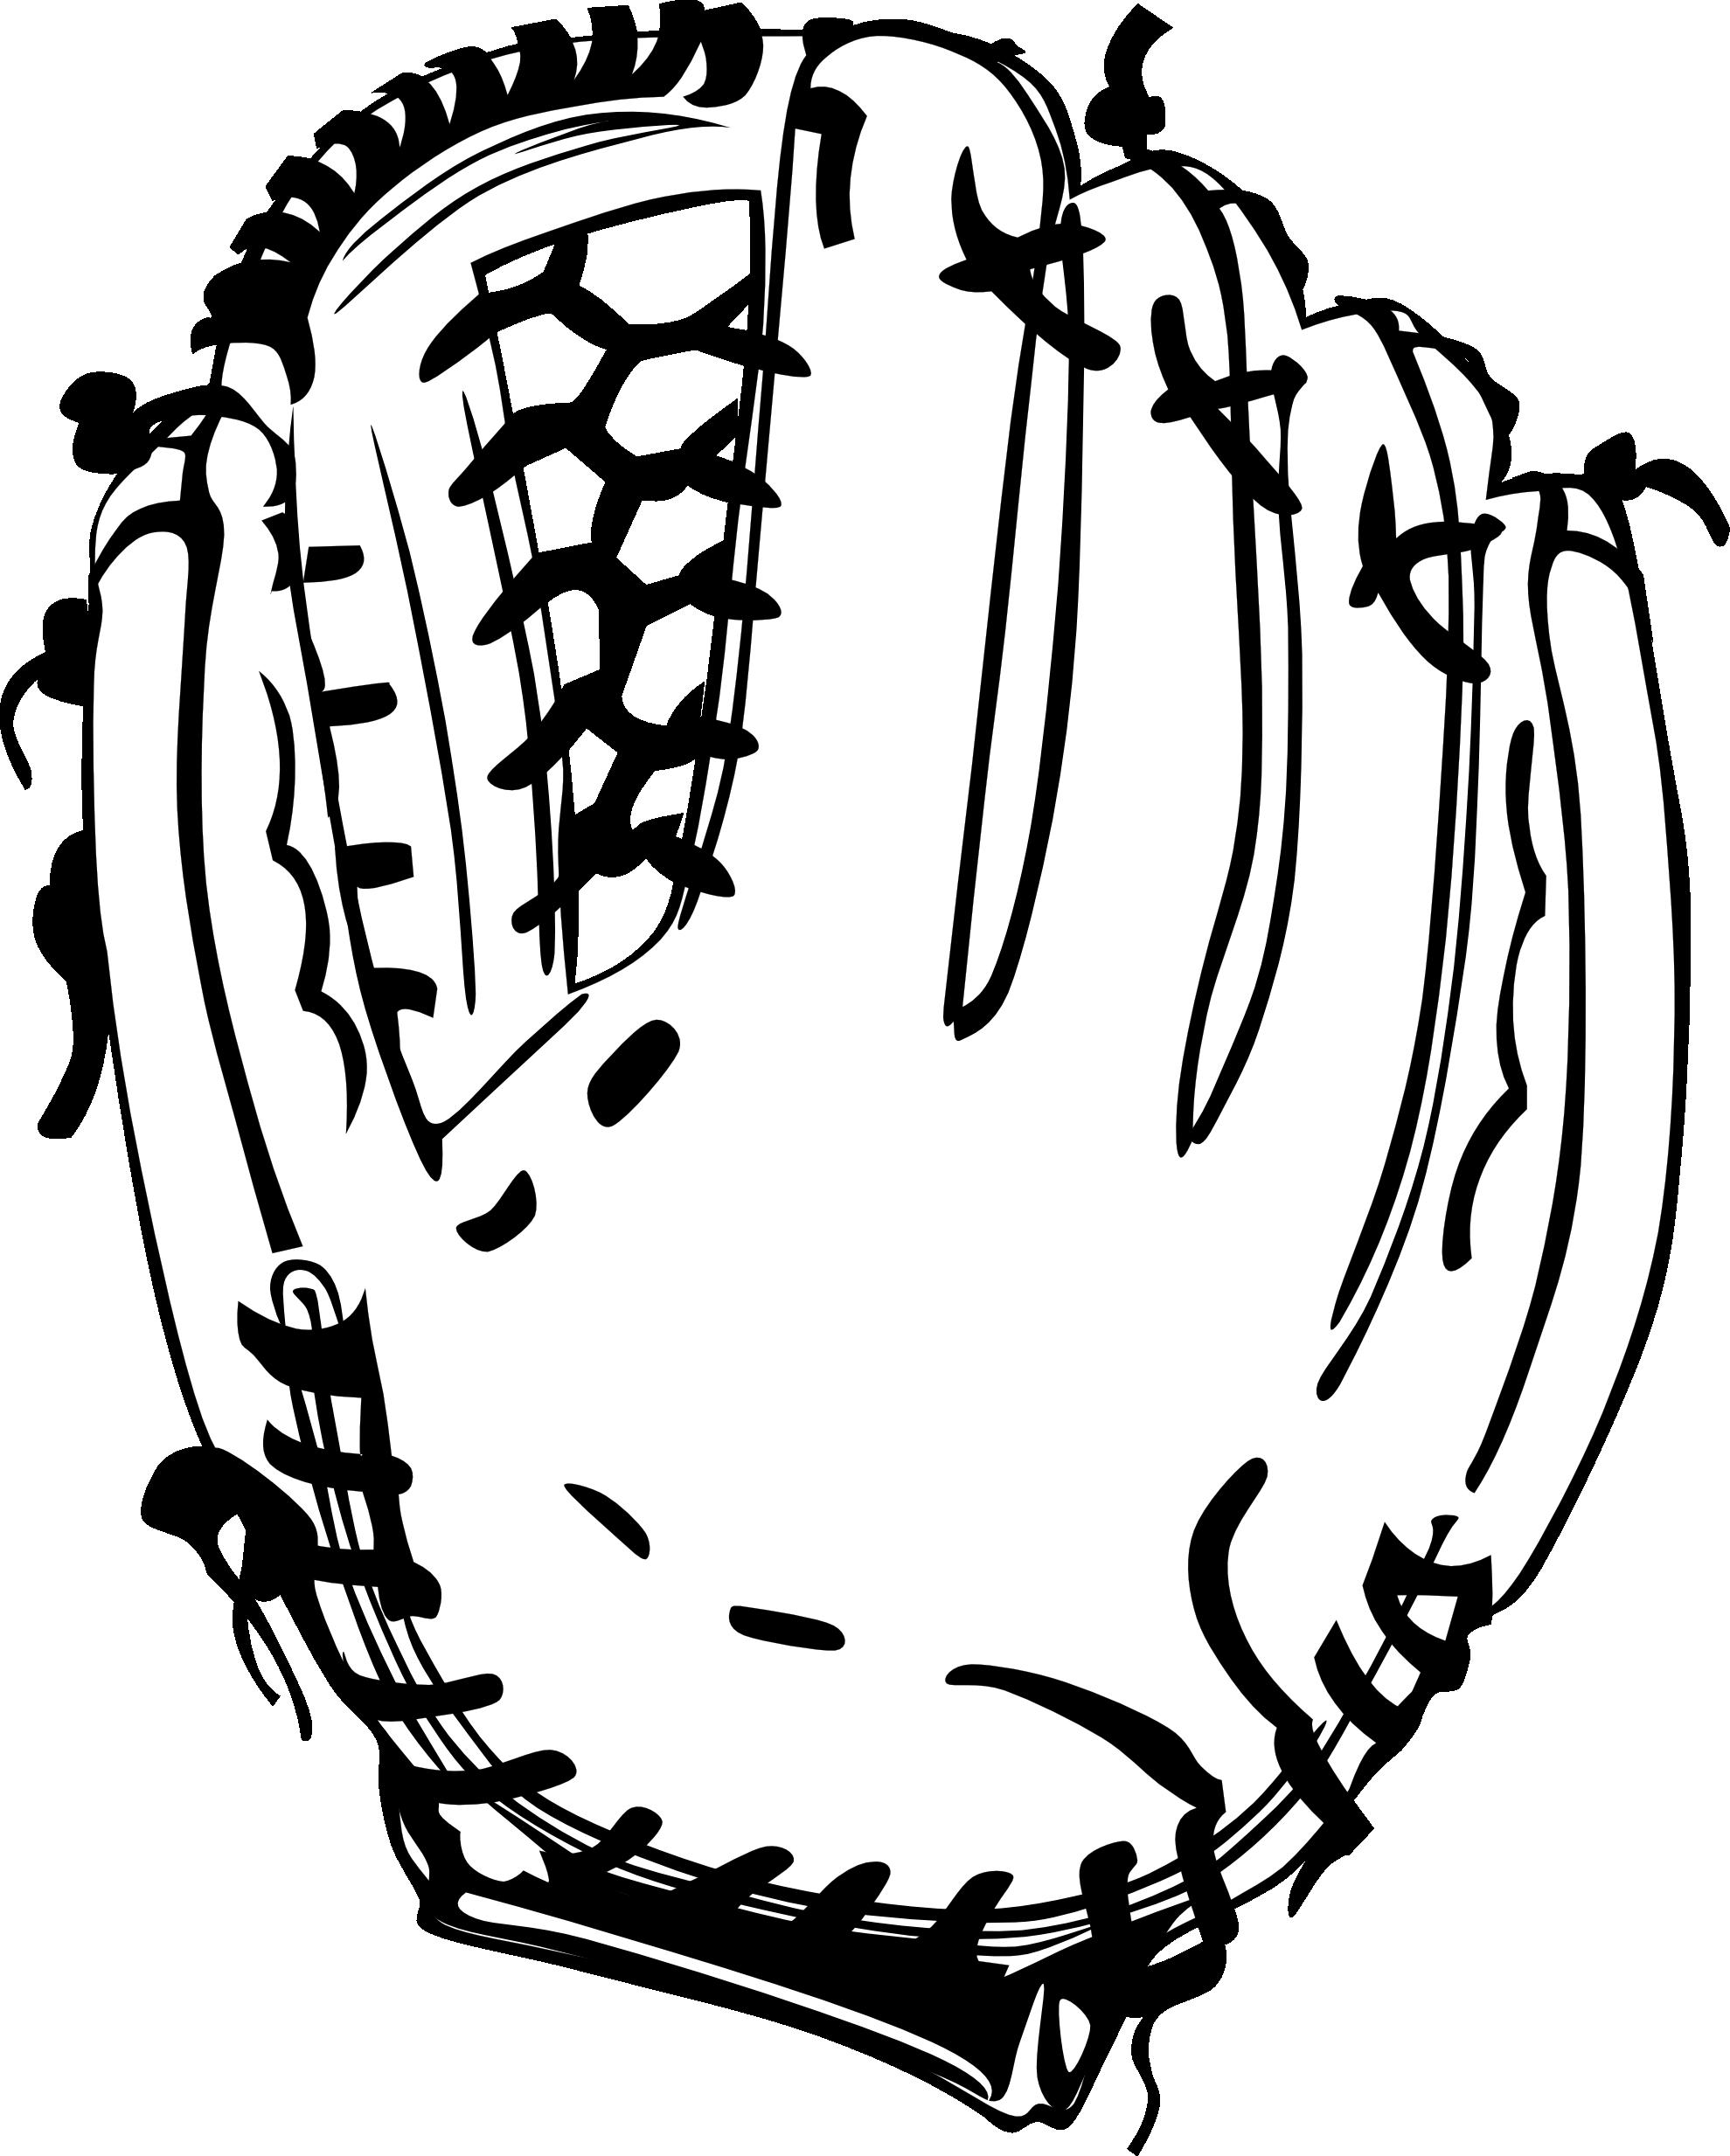 Baseball bats crossed clipart jpg free Baseball Bat Vector | Clipart library - Free Clipart Images - Clip ... jpg free